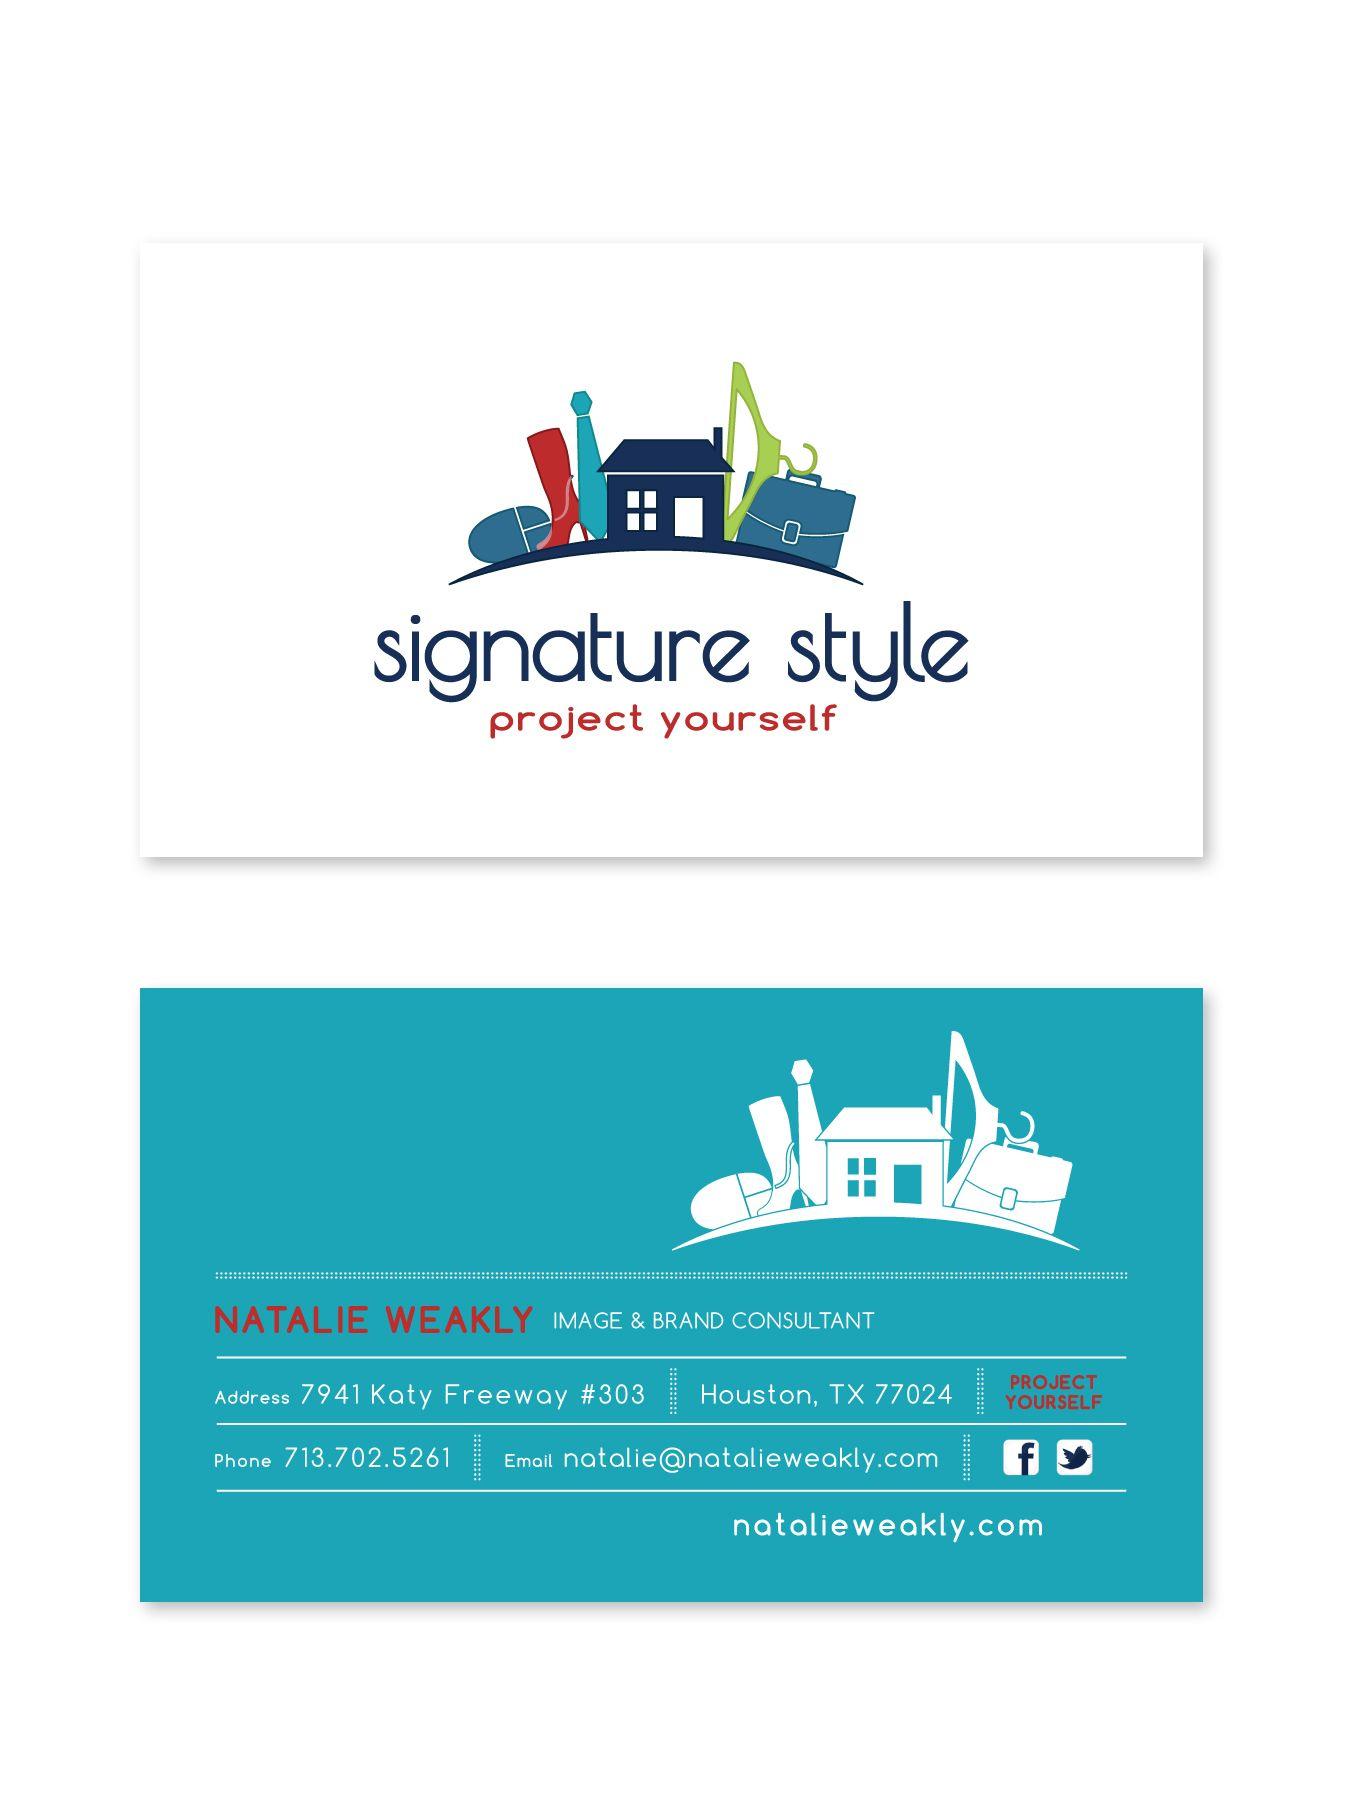 Website Design And Development Desautels Designs Business Card Design Card Design Website Design